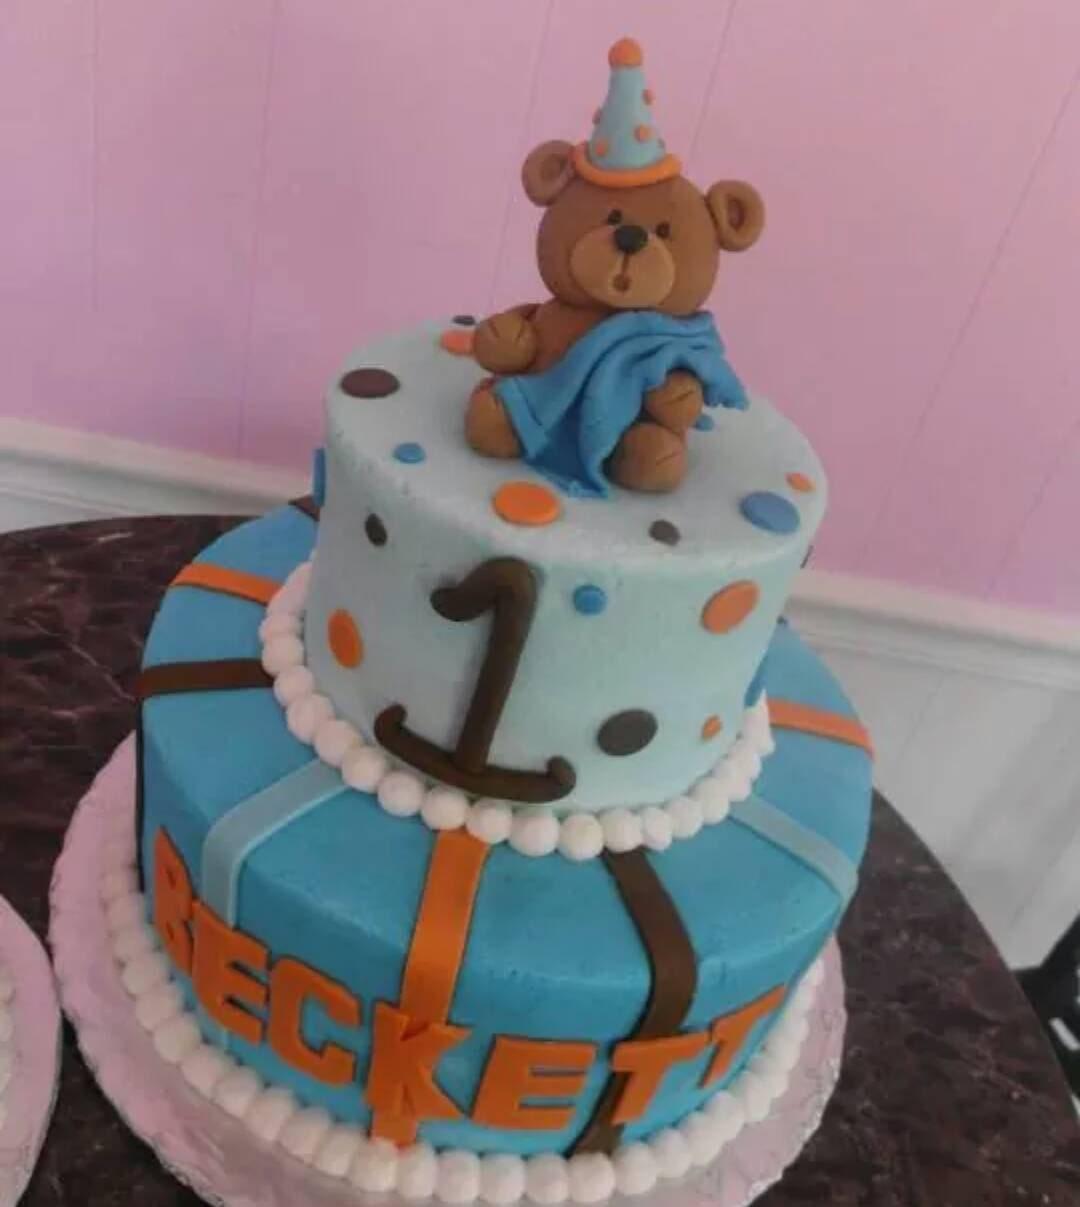 Handmade Fondant Teddy Bear cake topper set by dallas2001 ...